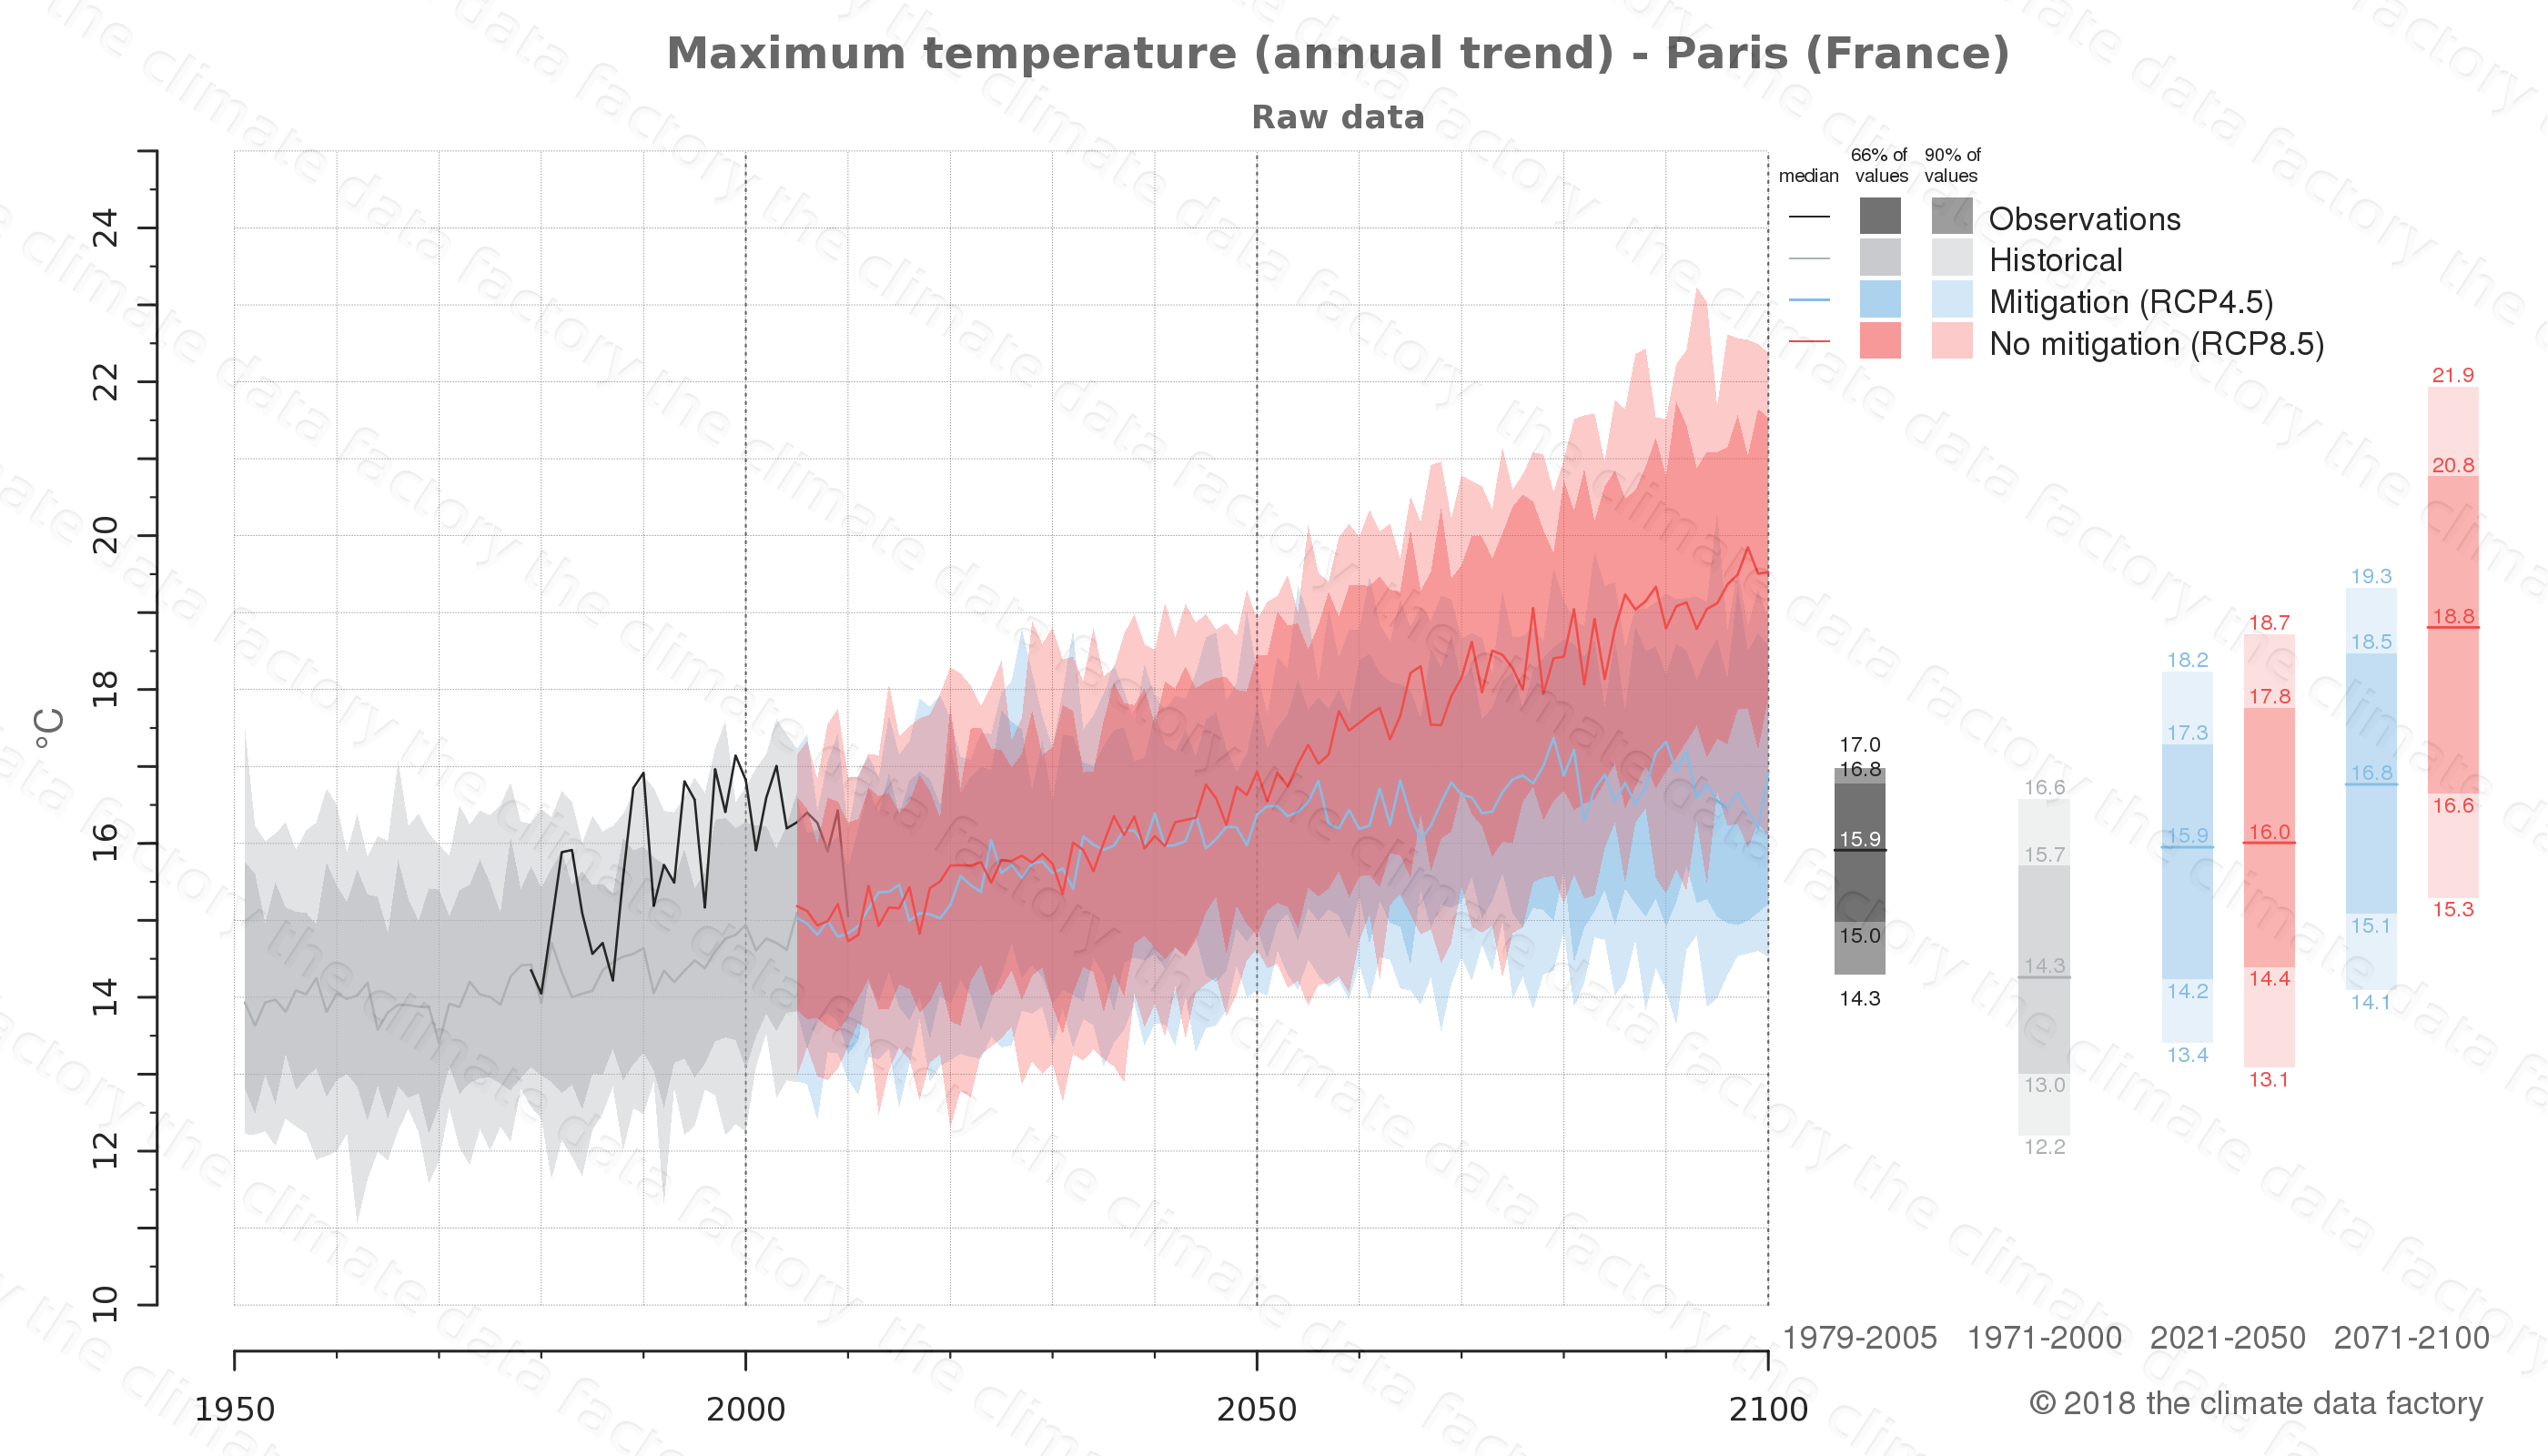 climate change data policy adaptation climate graph city data maximum-temperature paris france